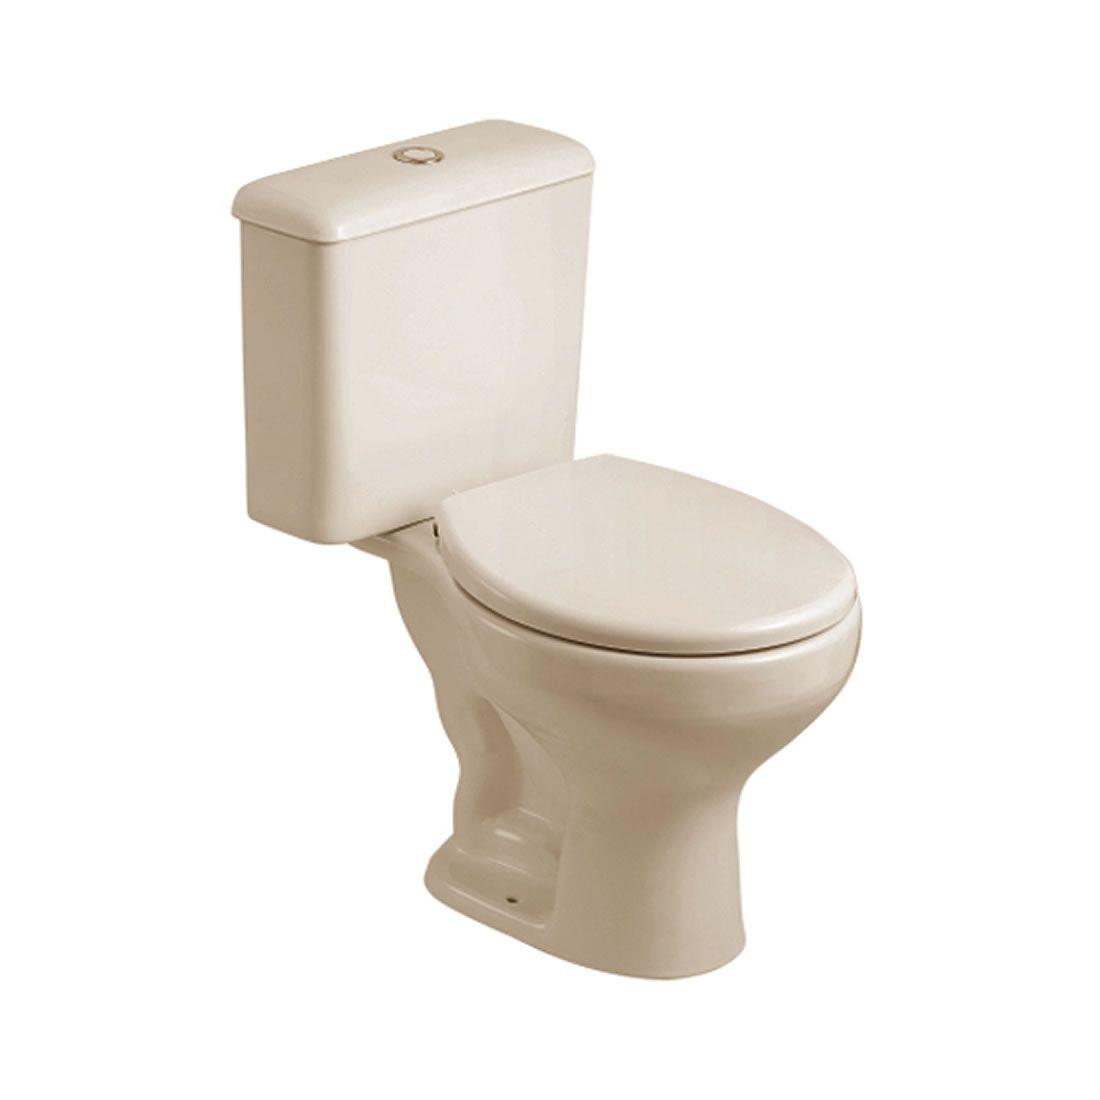 Conjunto Vaso Sanitário com Caixa Acoplada Saveiro Pergamon Celite